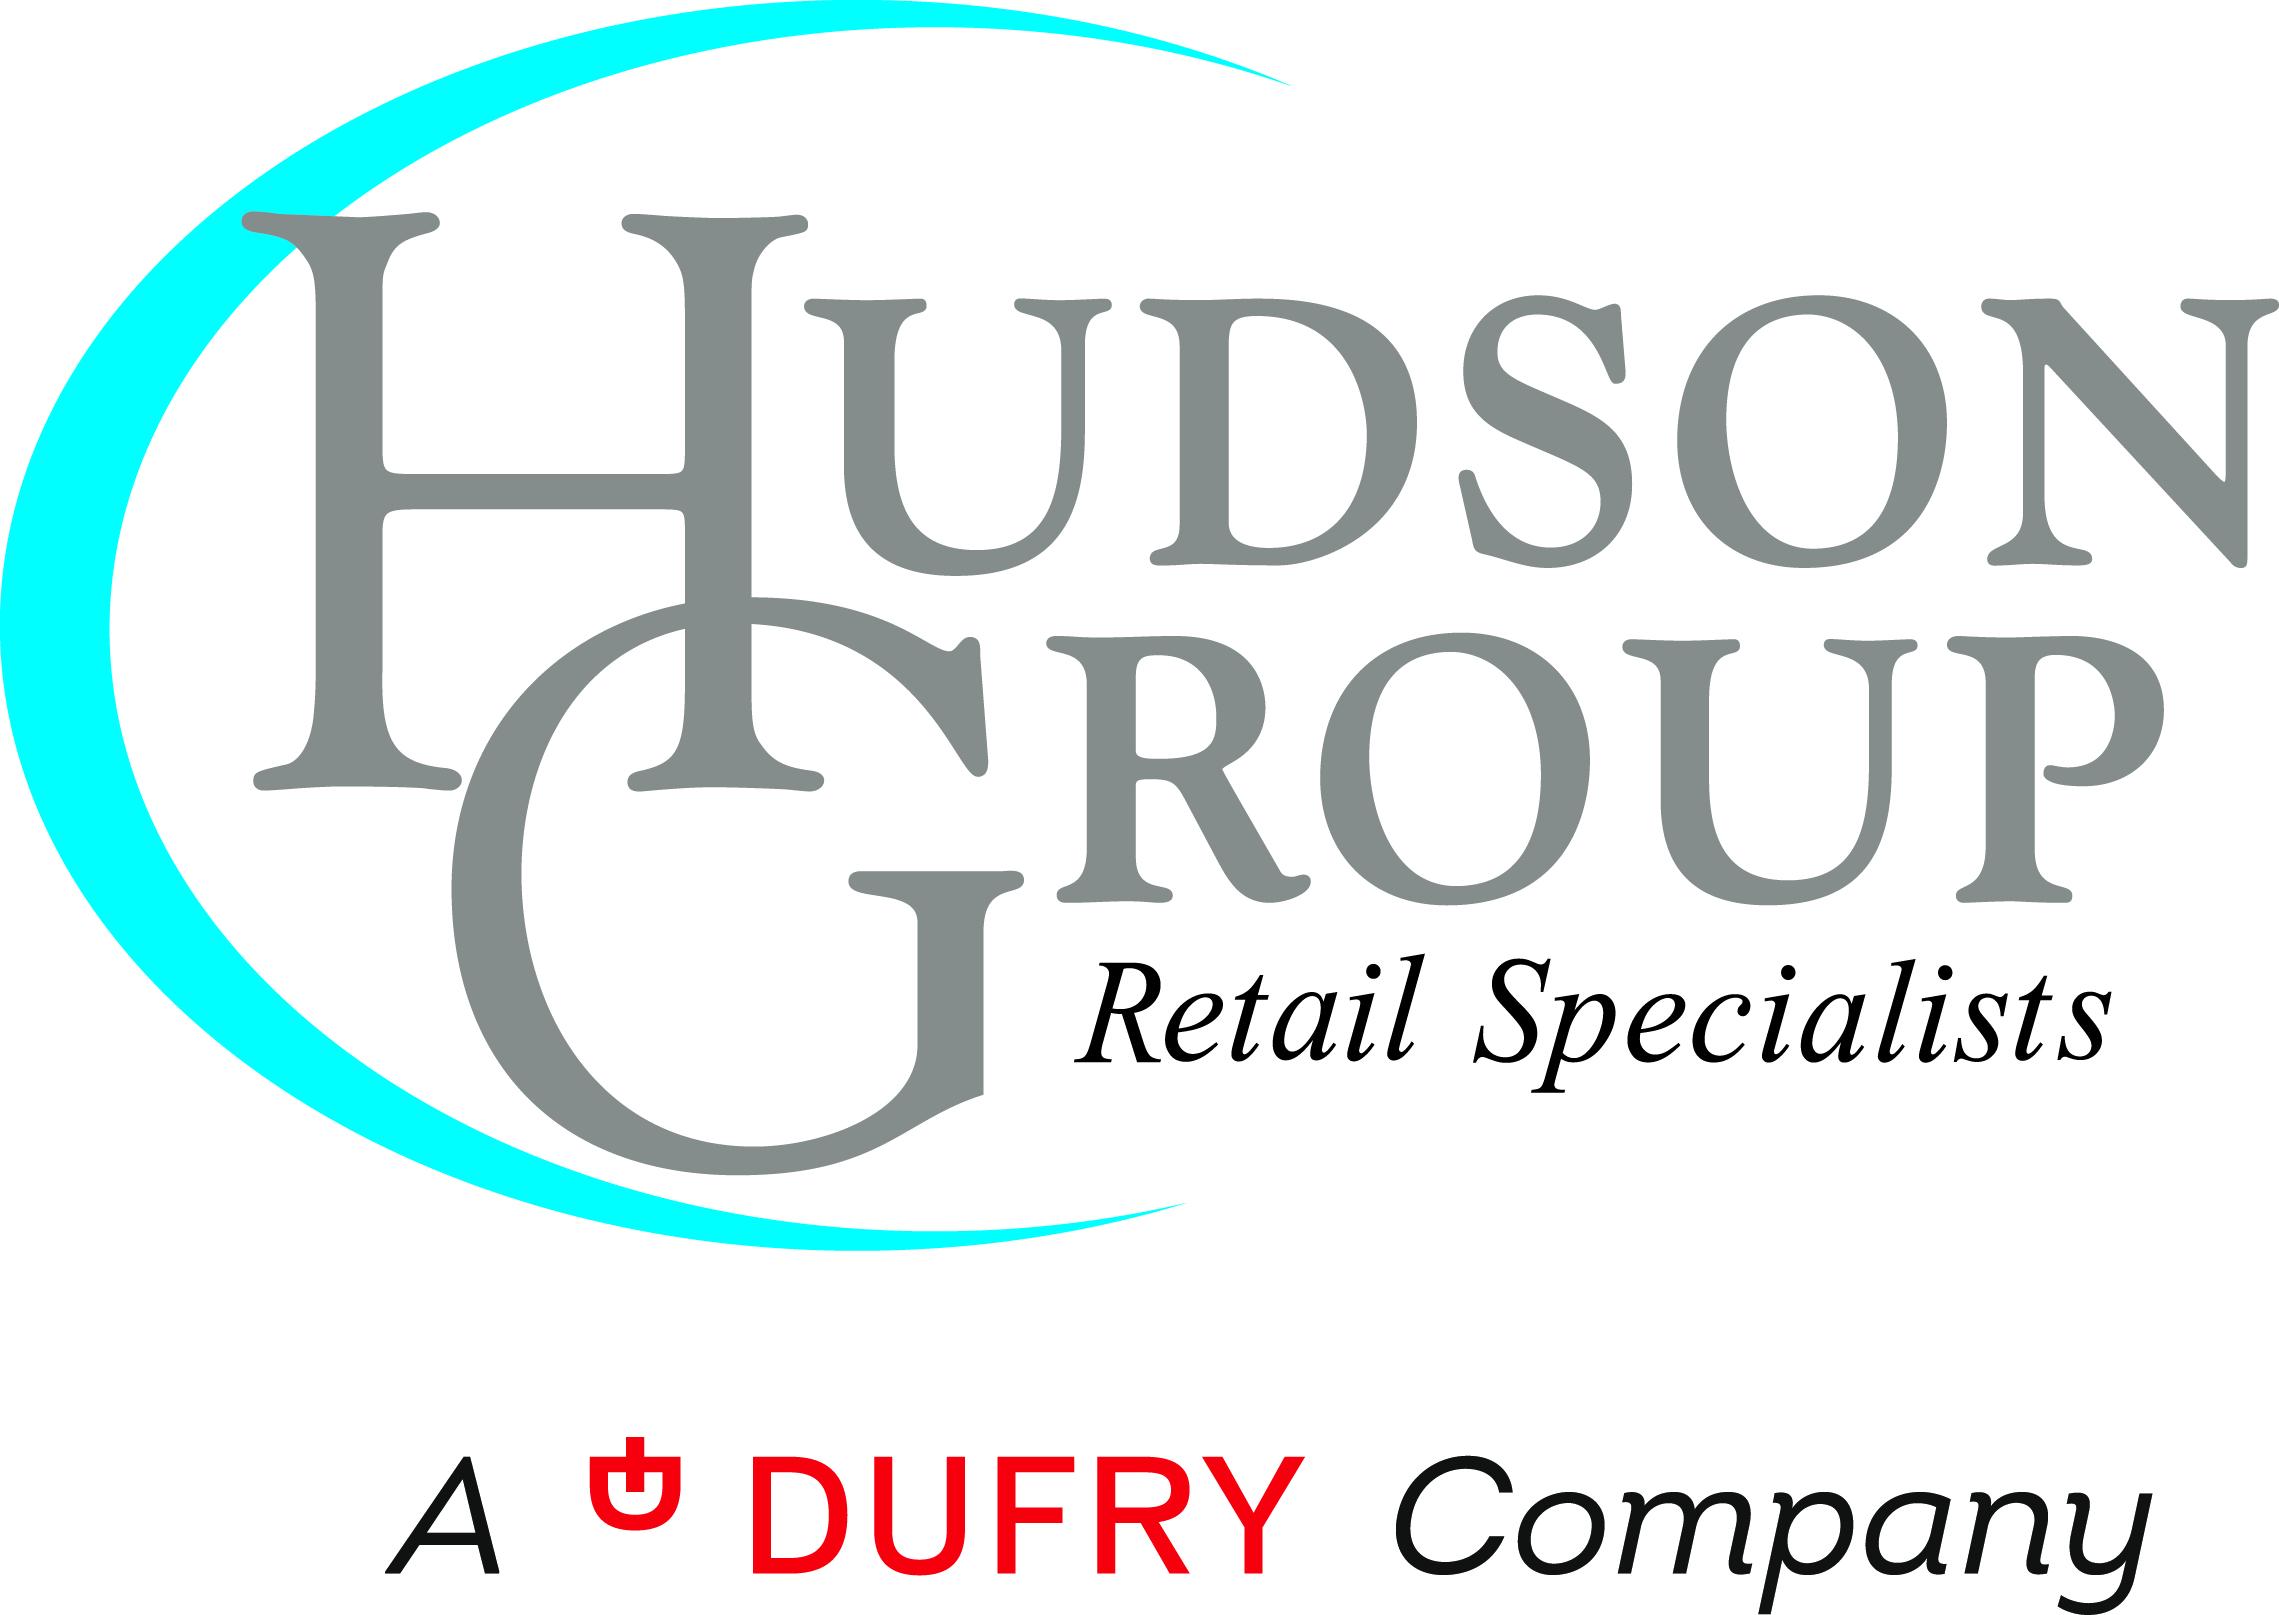 hudson_New dufry_logo